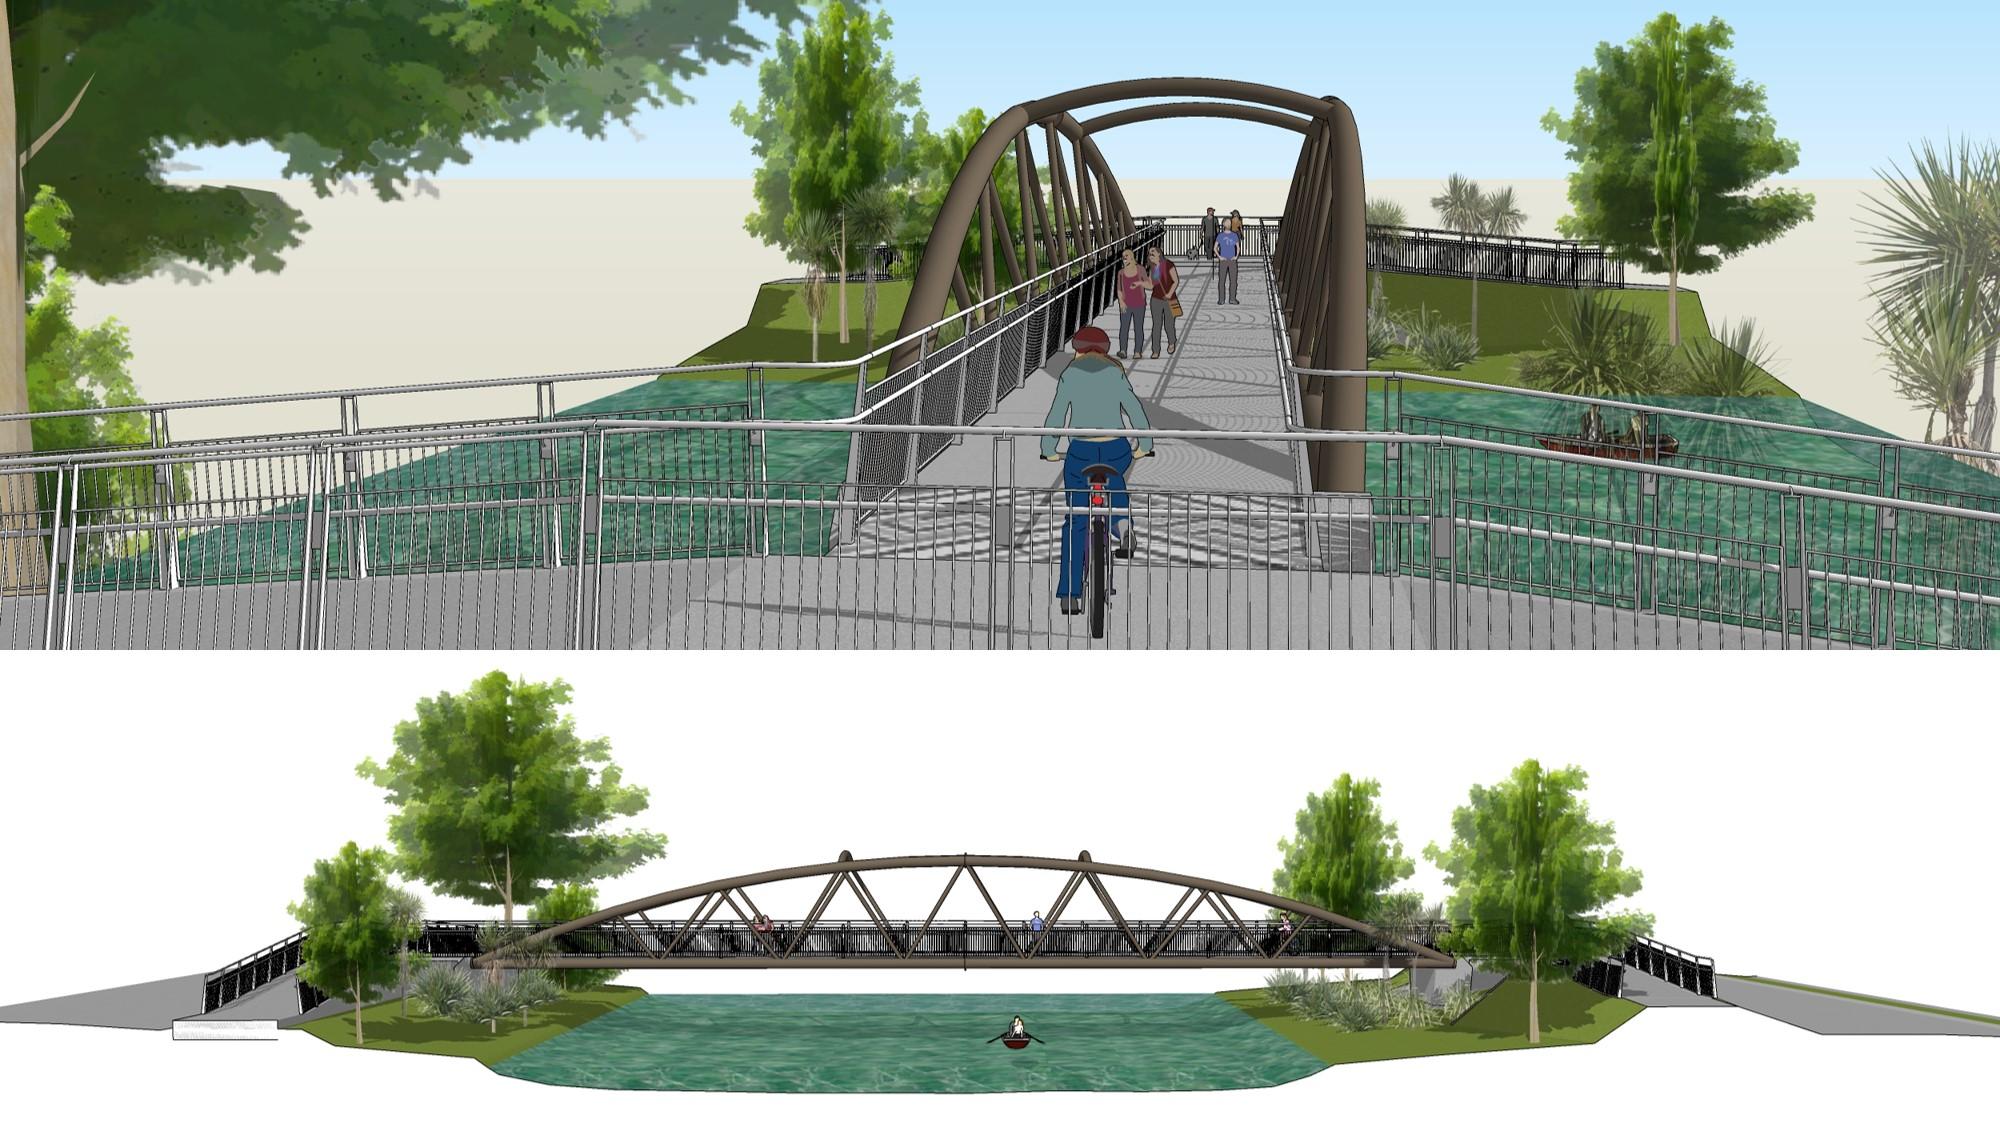 'Medway Bridge concept 2